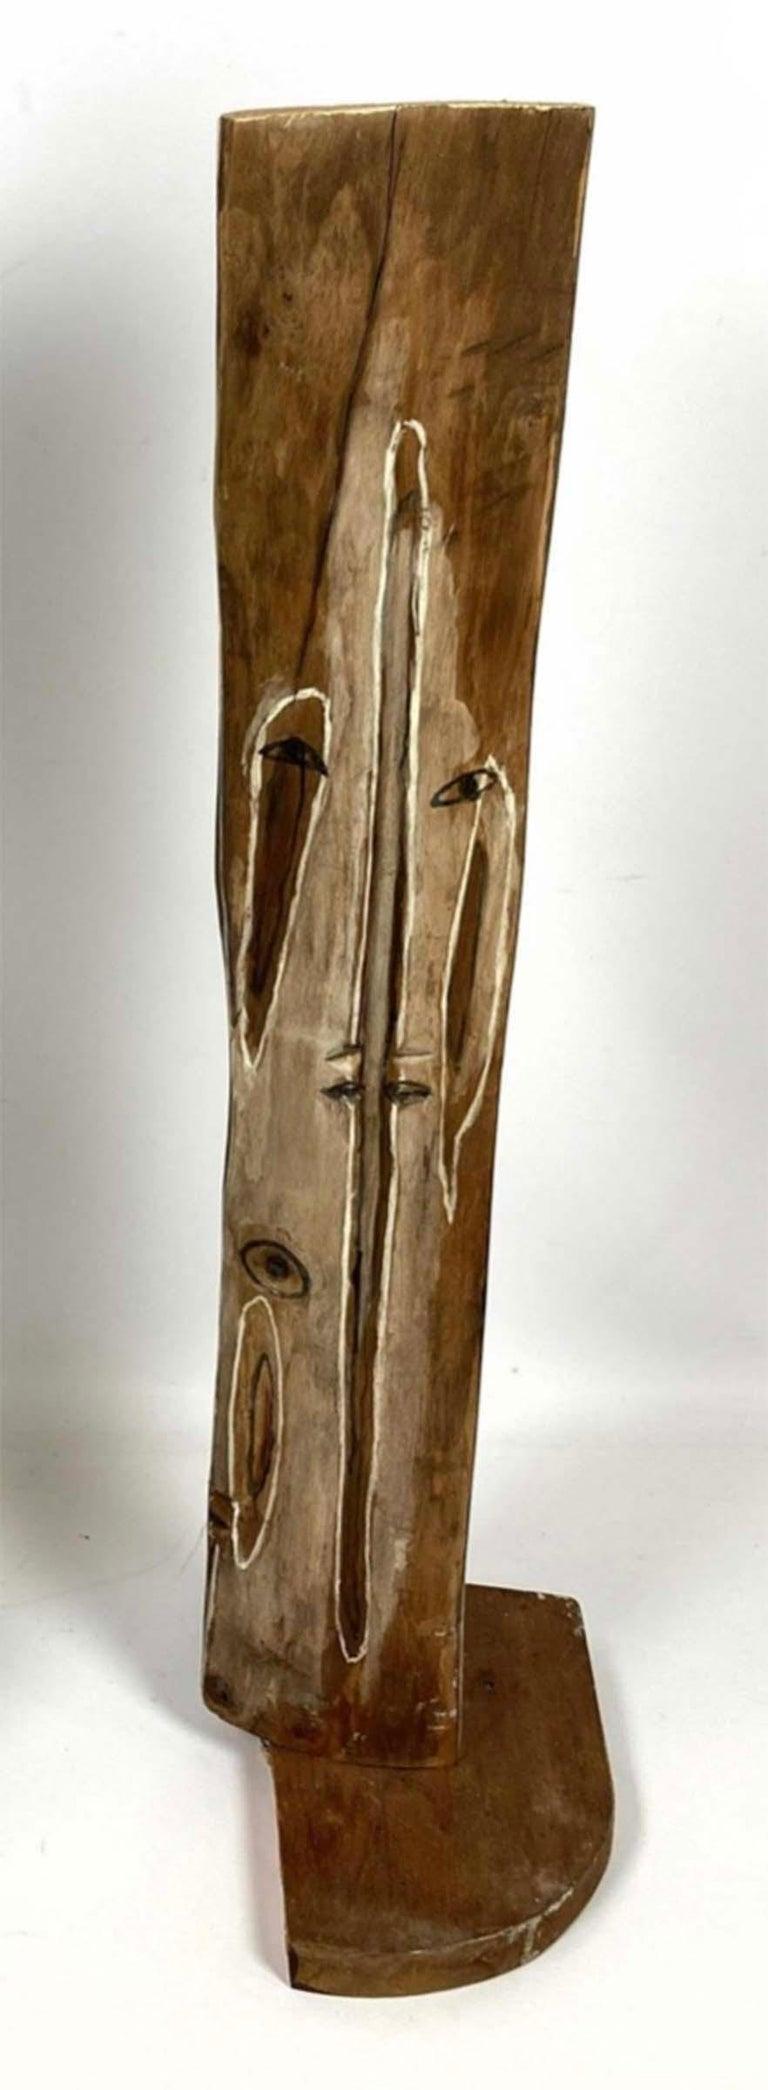 Modernist Face - Sculpture by ITZHAK SANKOWSKY